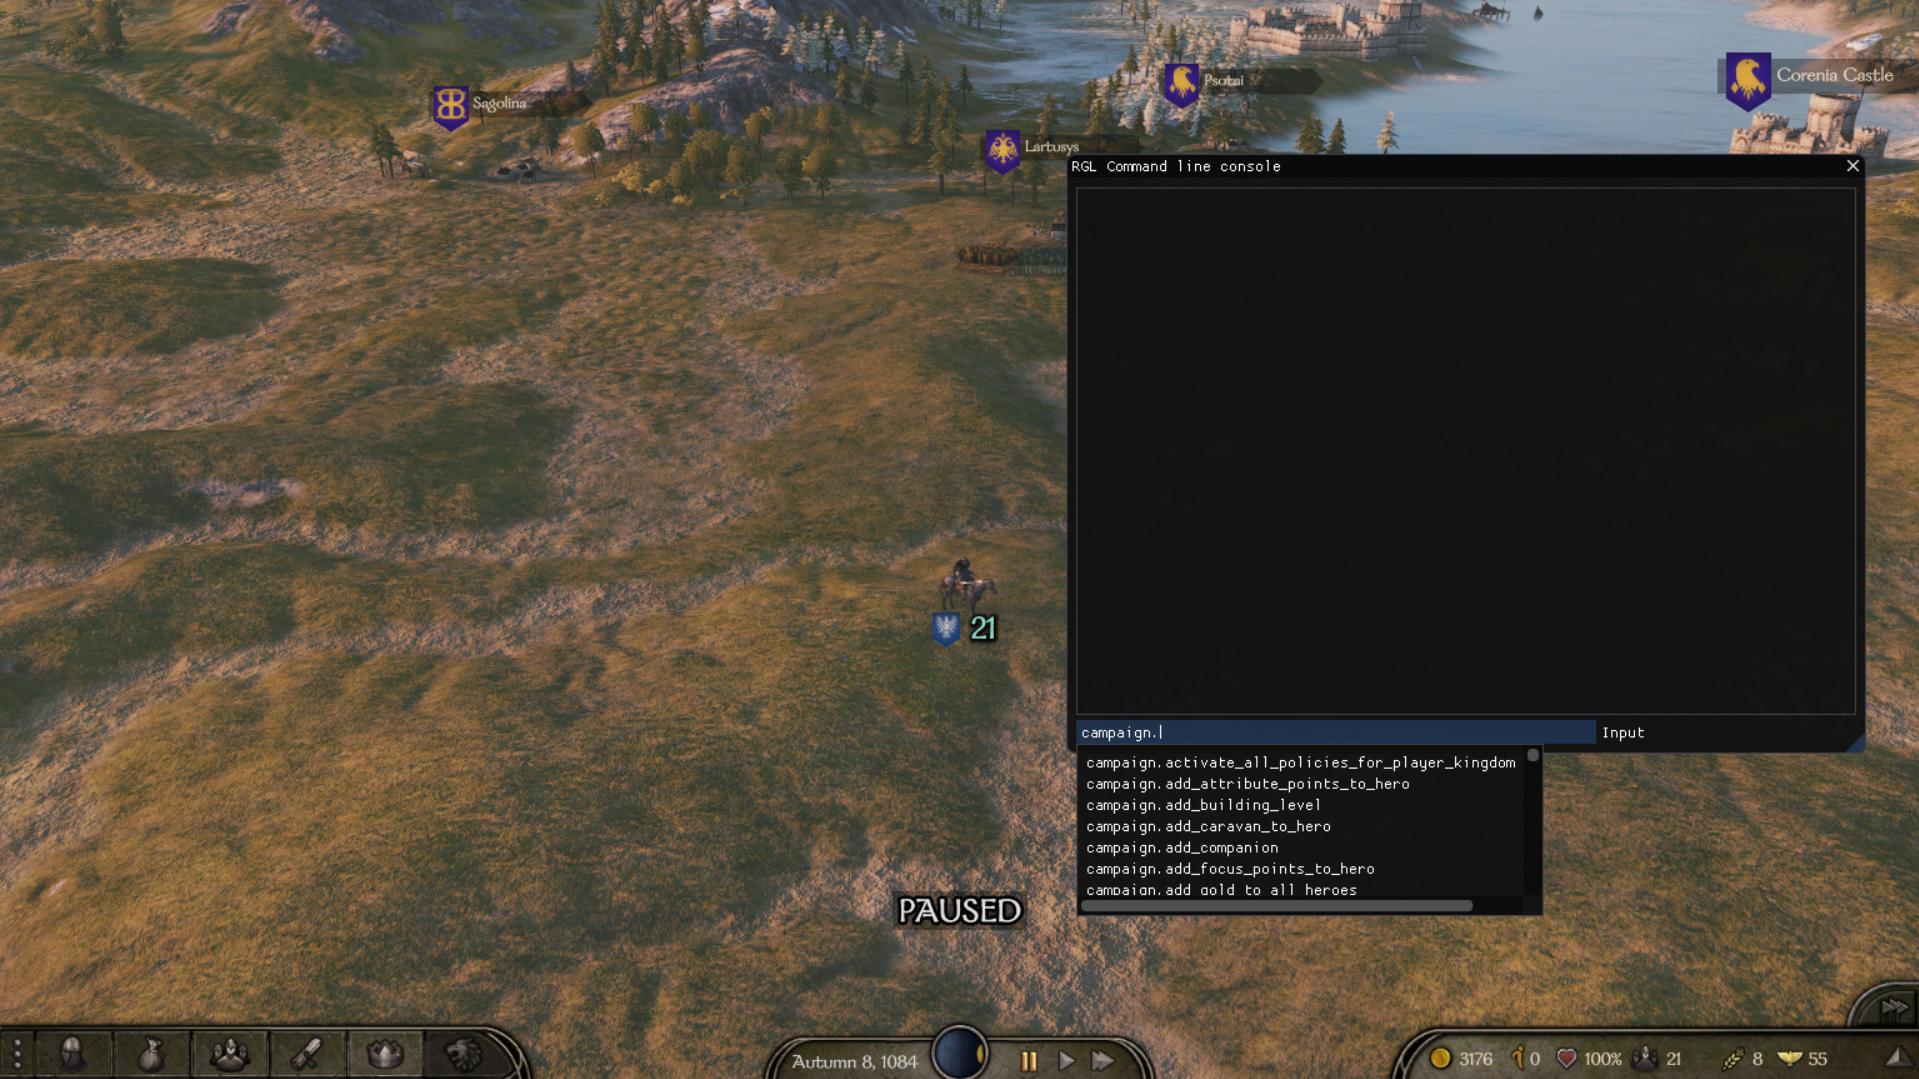 Developer Console | Консоль разработчика